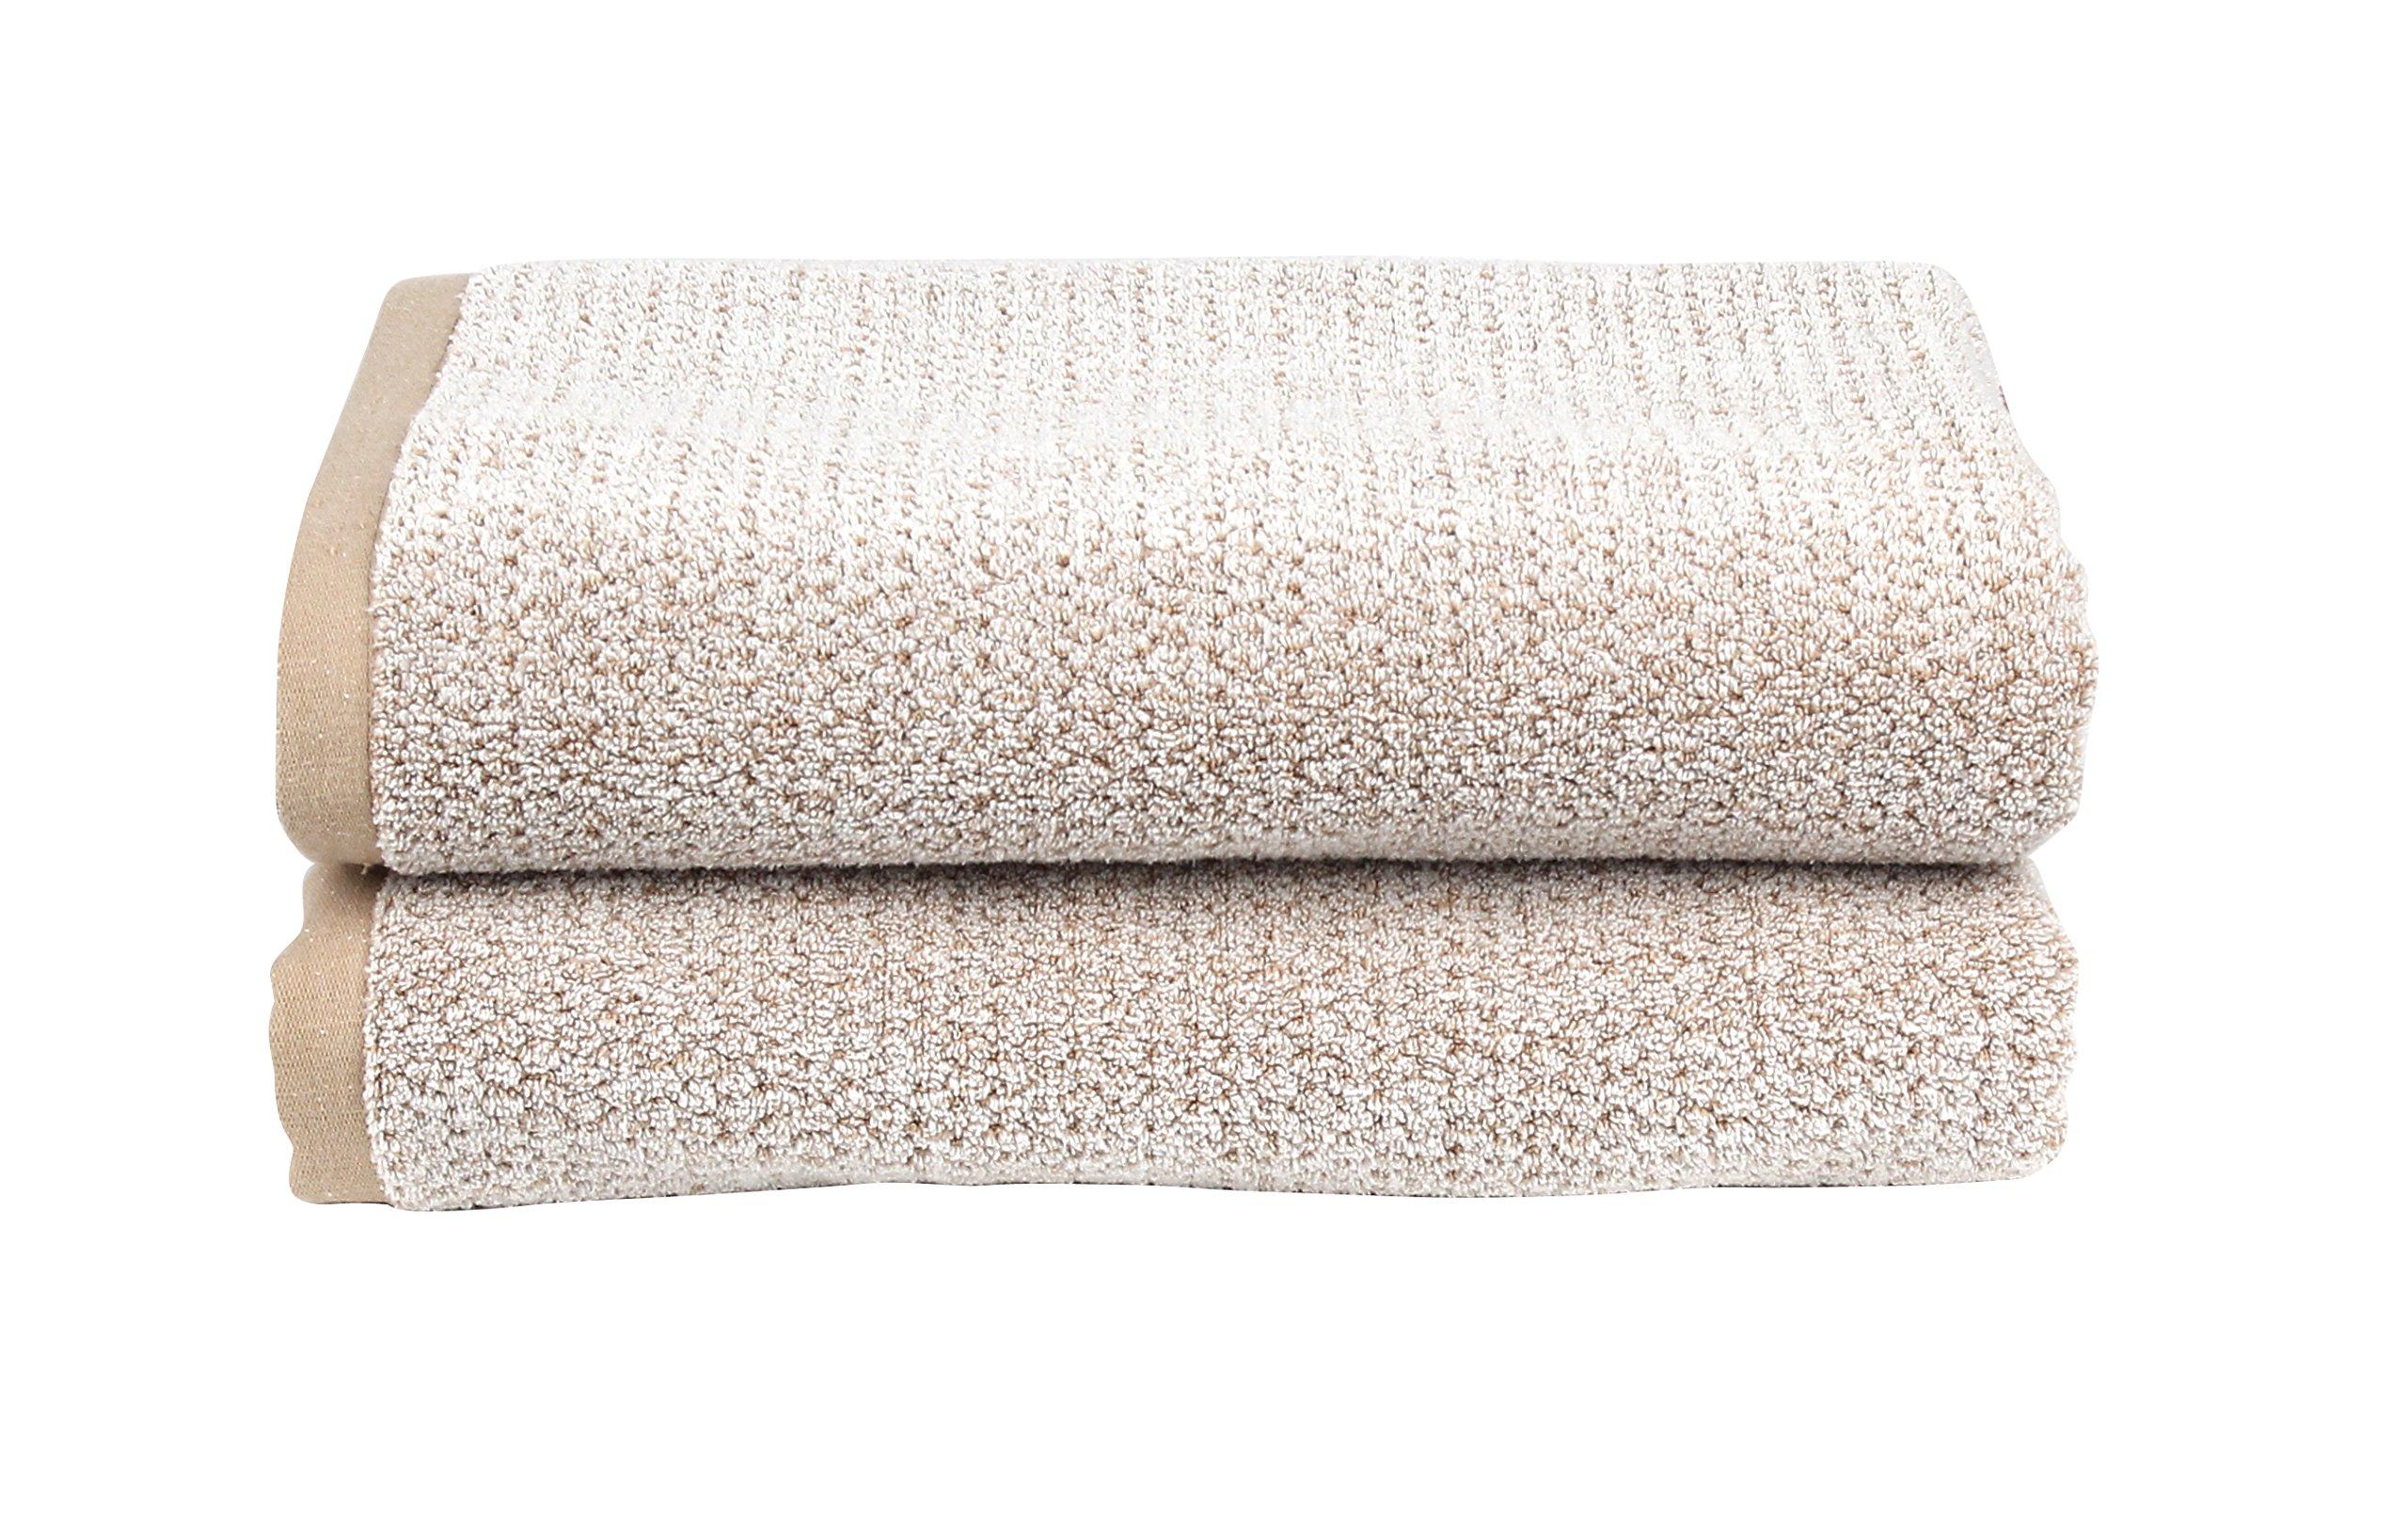 Everplush Diamond Jacquard Bath Towel, Set of 2, Caramel Brown - DJBathTowel2